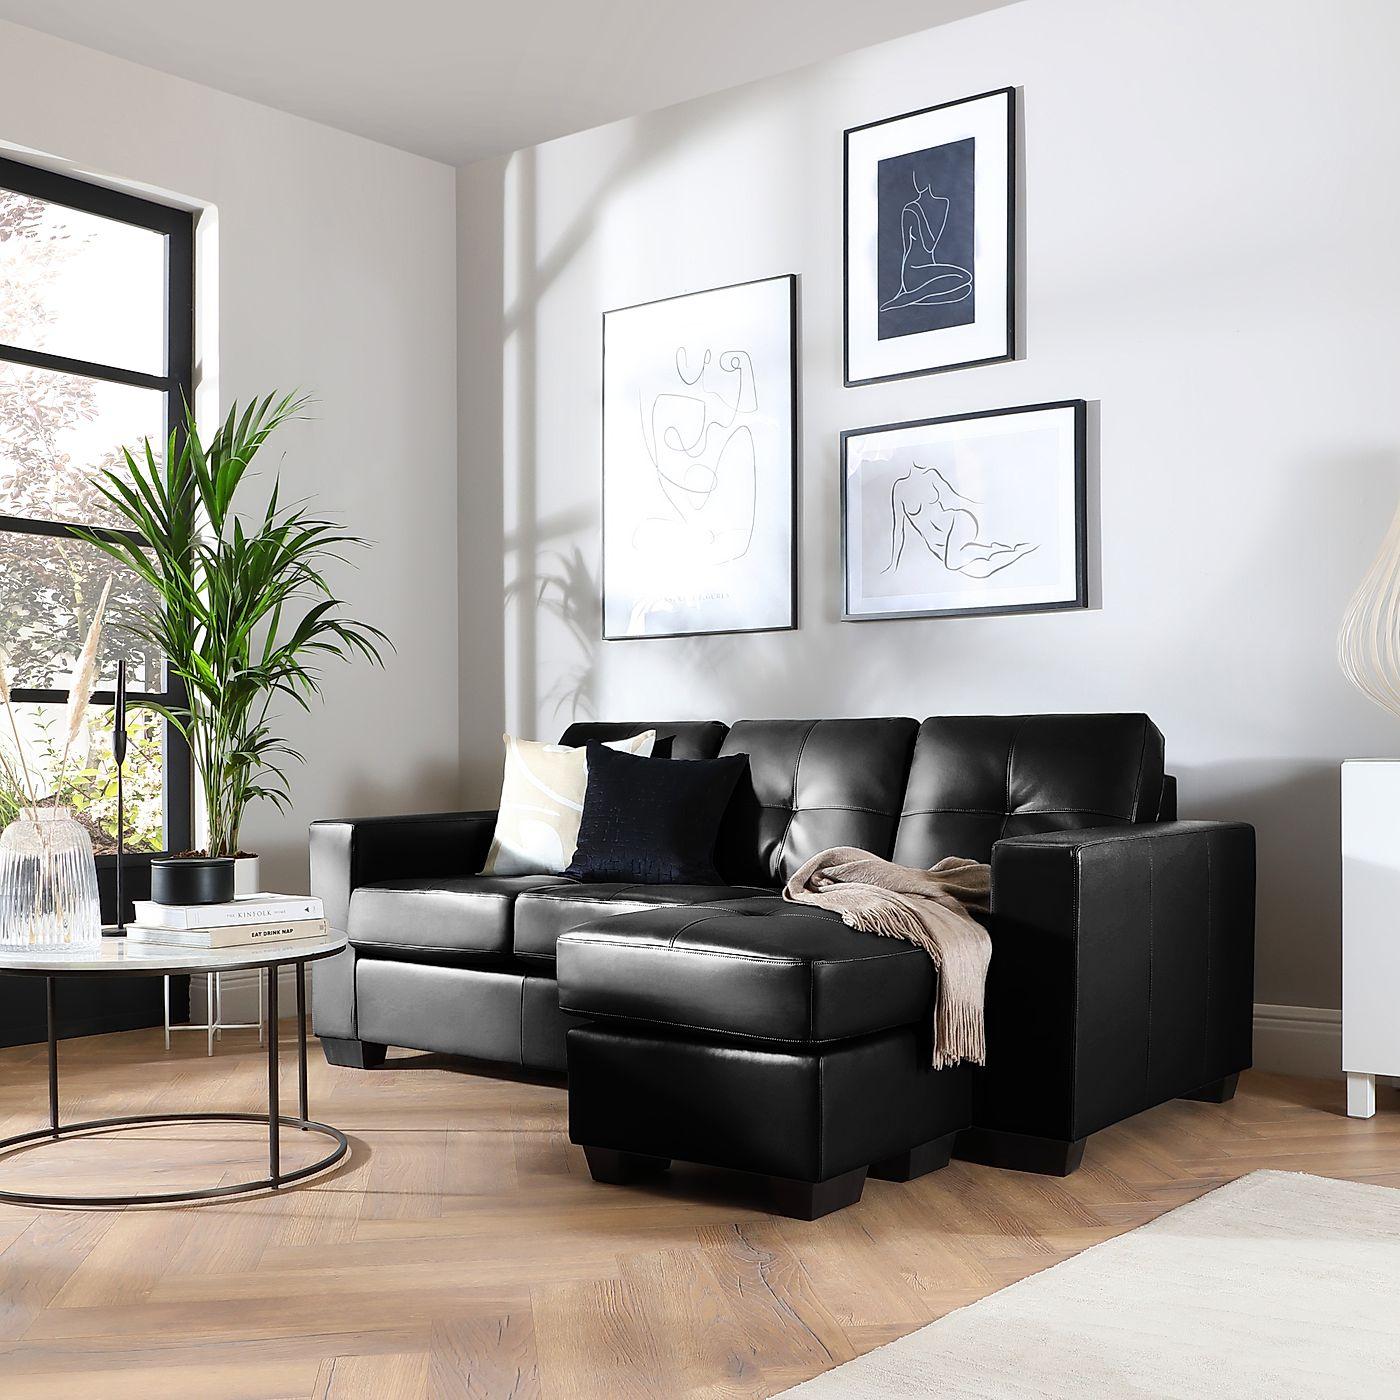 Rio Black Leather L Shape Corner Sofa   Furniture Choice With Regard To Leather Corner Sofas (View 2 of 15)